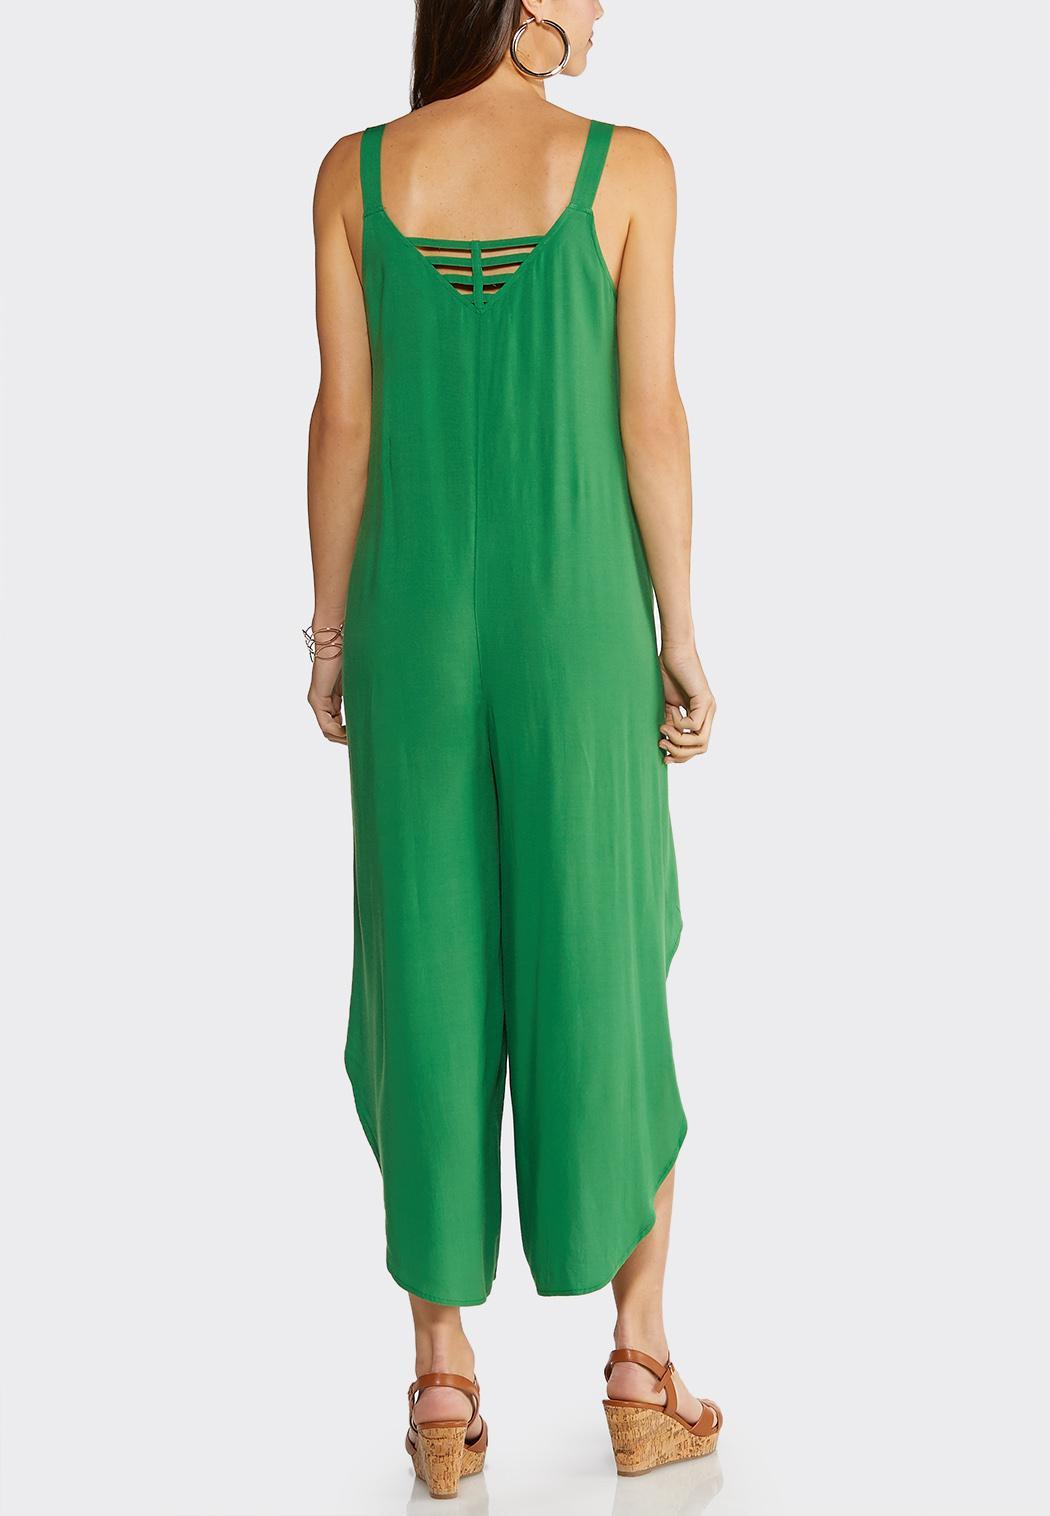 Plus Size Lattice Back Genie Jumpsuit (Item #43853936)